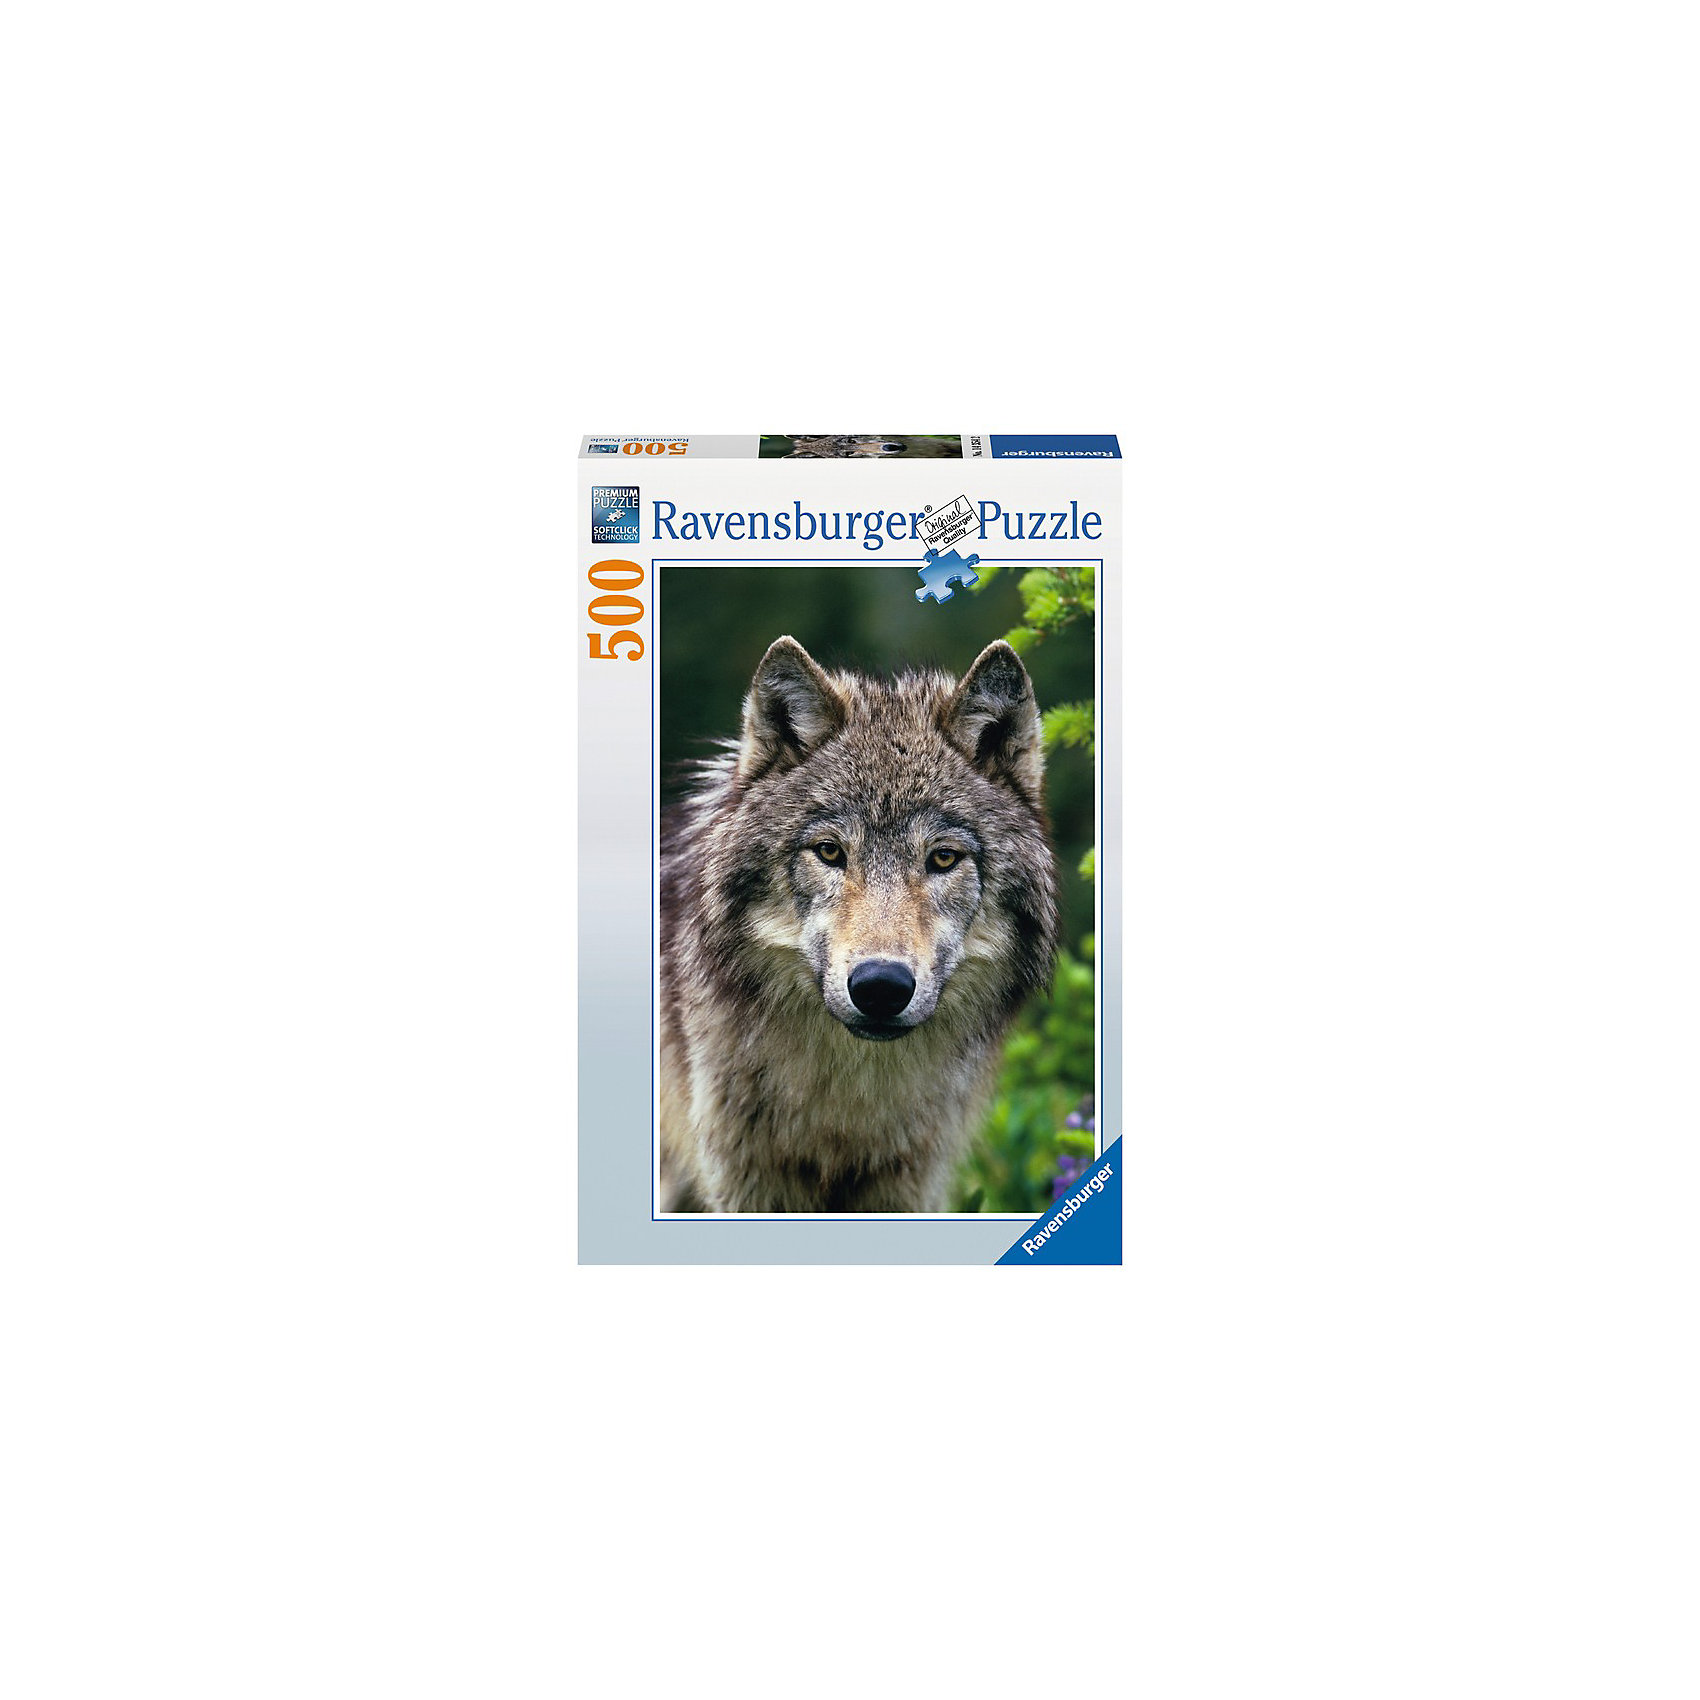 Ravensburger Пазл «Волк» 500 деталей, Ravensburger ravensburger пазл волк 500 деталей